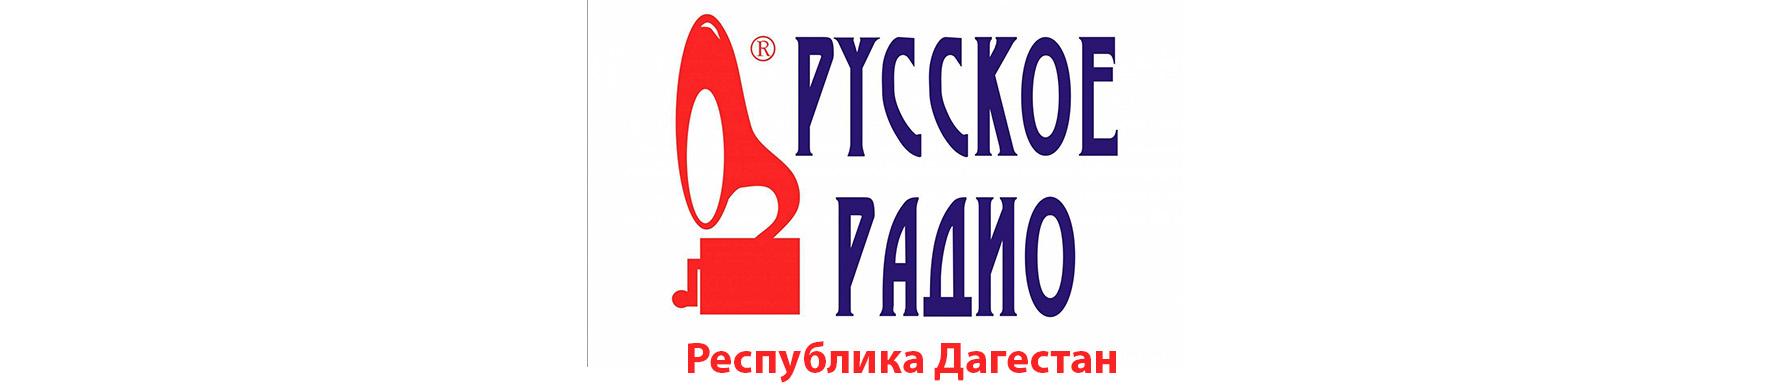 Реклама на радио в Дагестане Русское радио